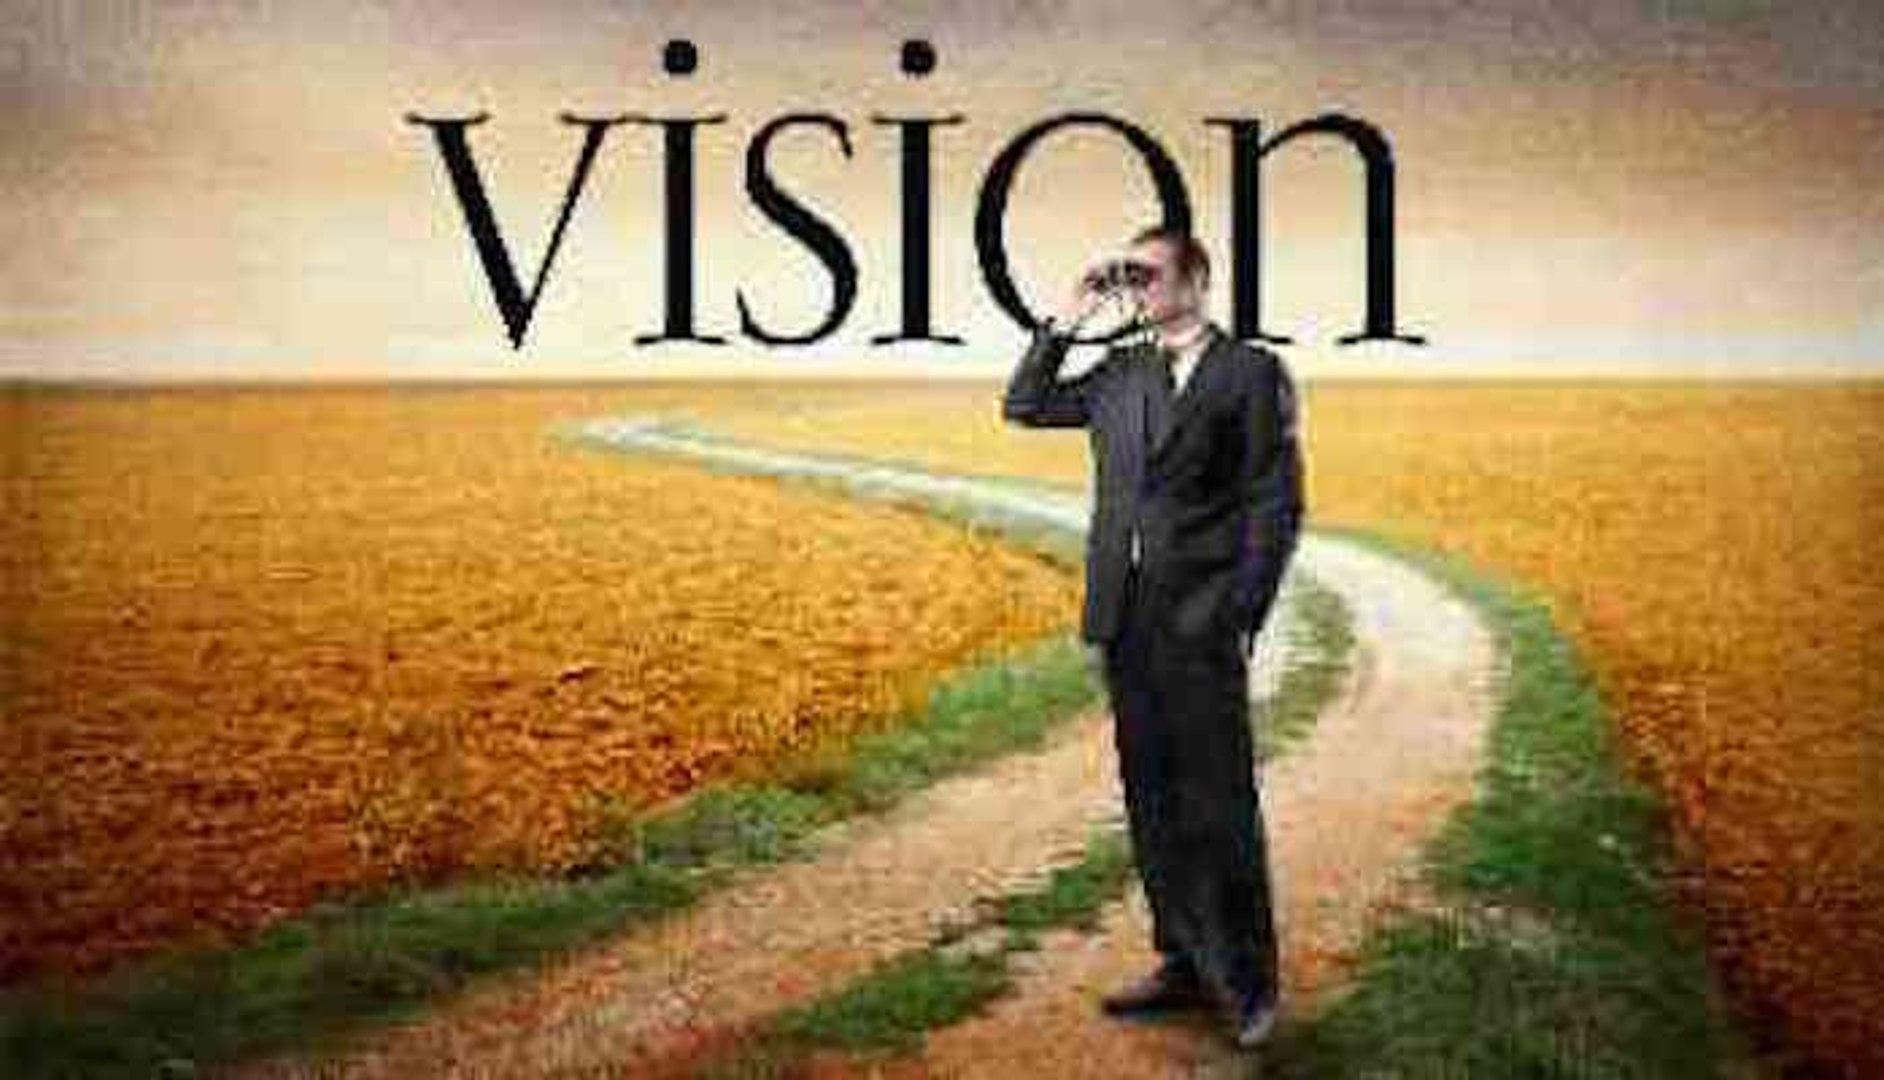 VISION - Motivational Video